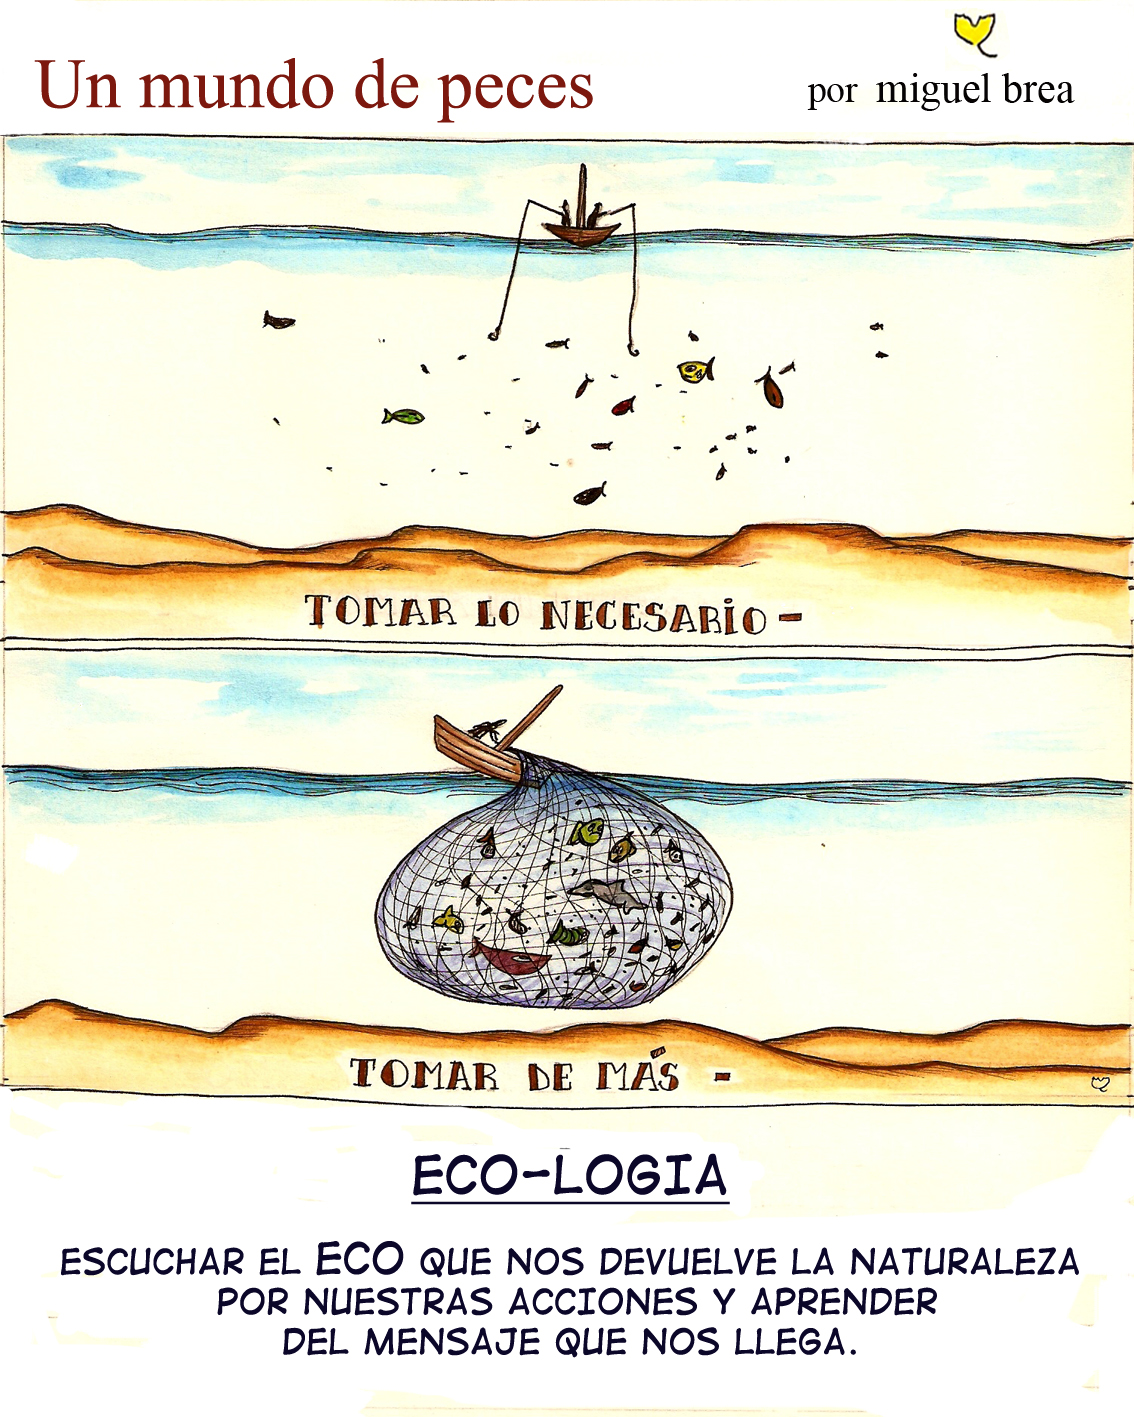 [Eco-logia.jpg]